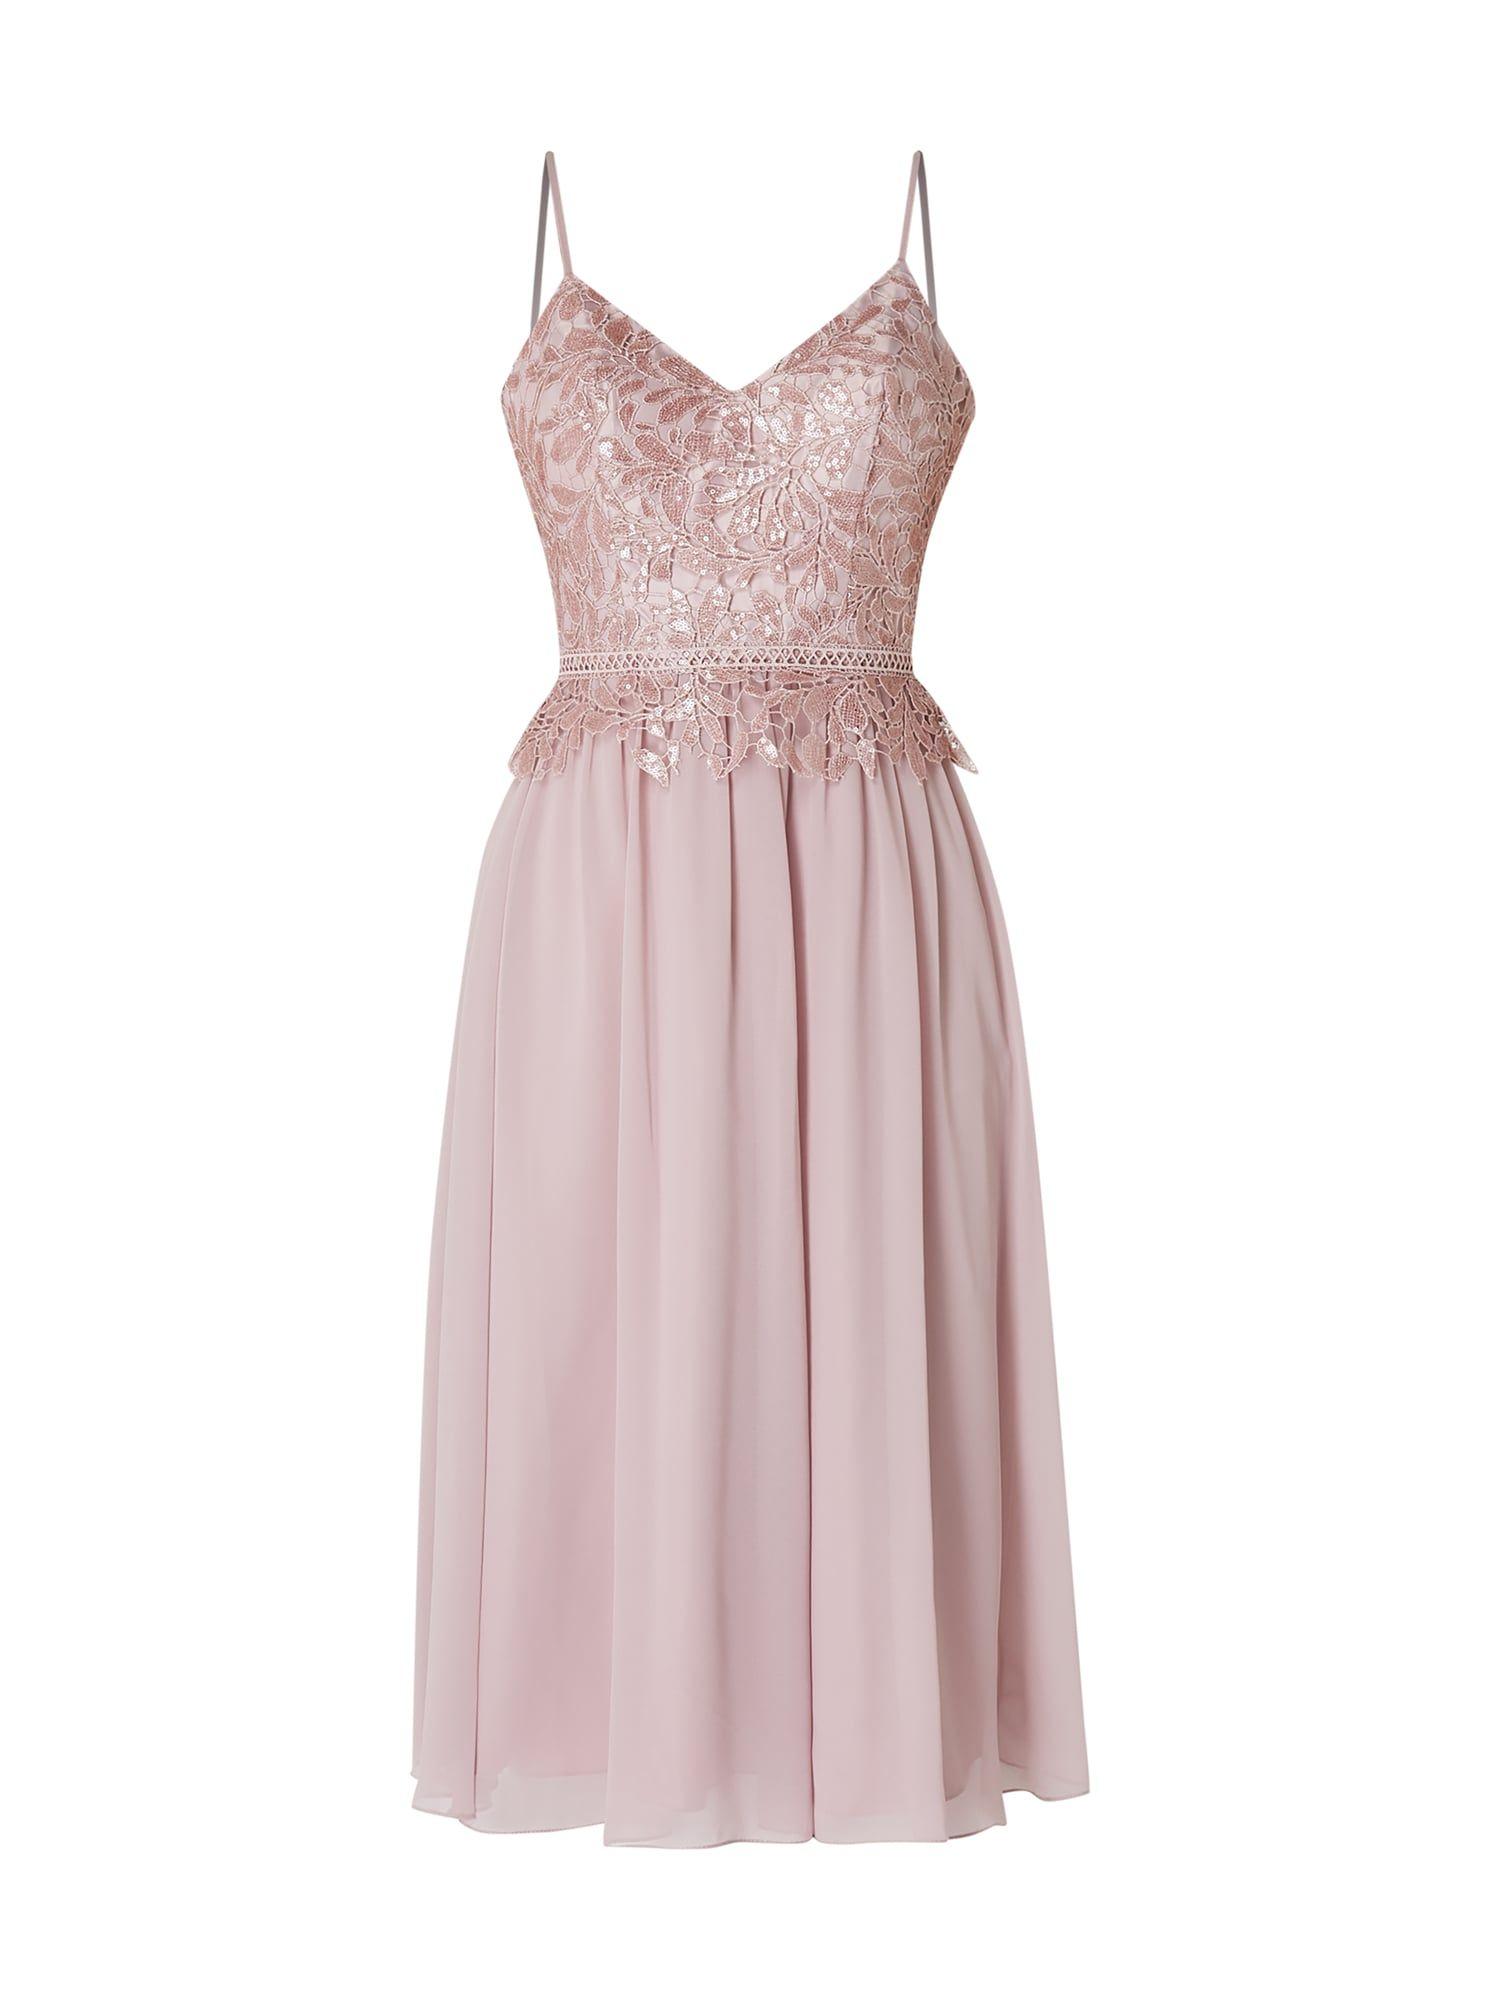 Laona - Cocktailkleid mit floraler Spitze - Rosé | Kleid ...